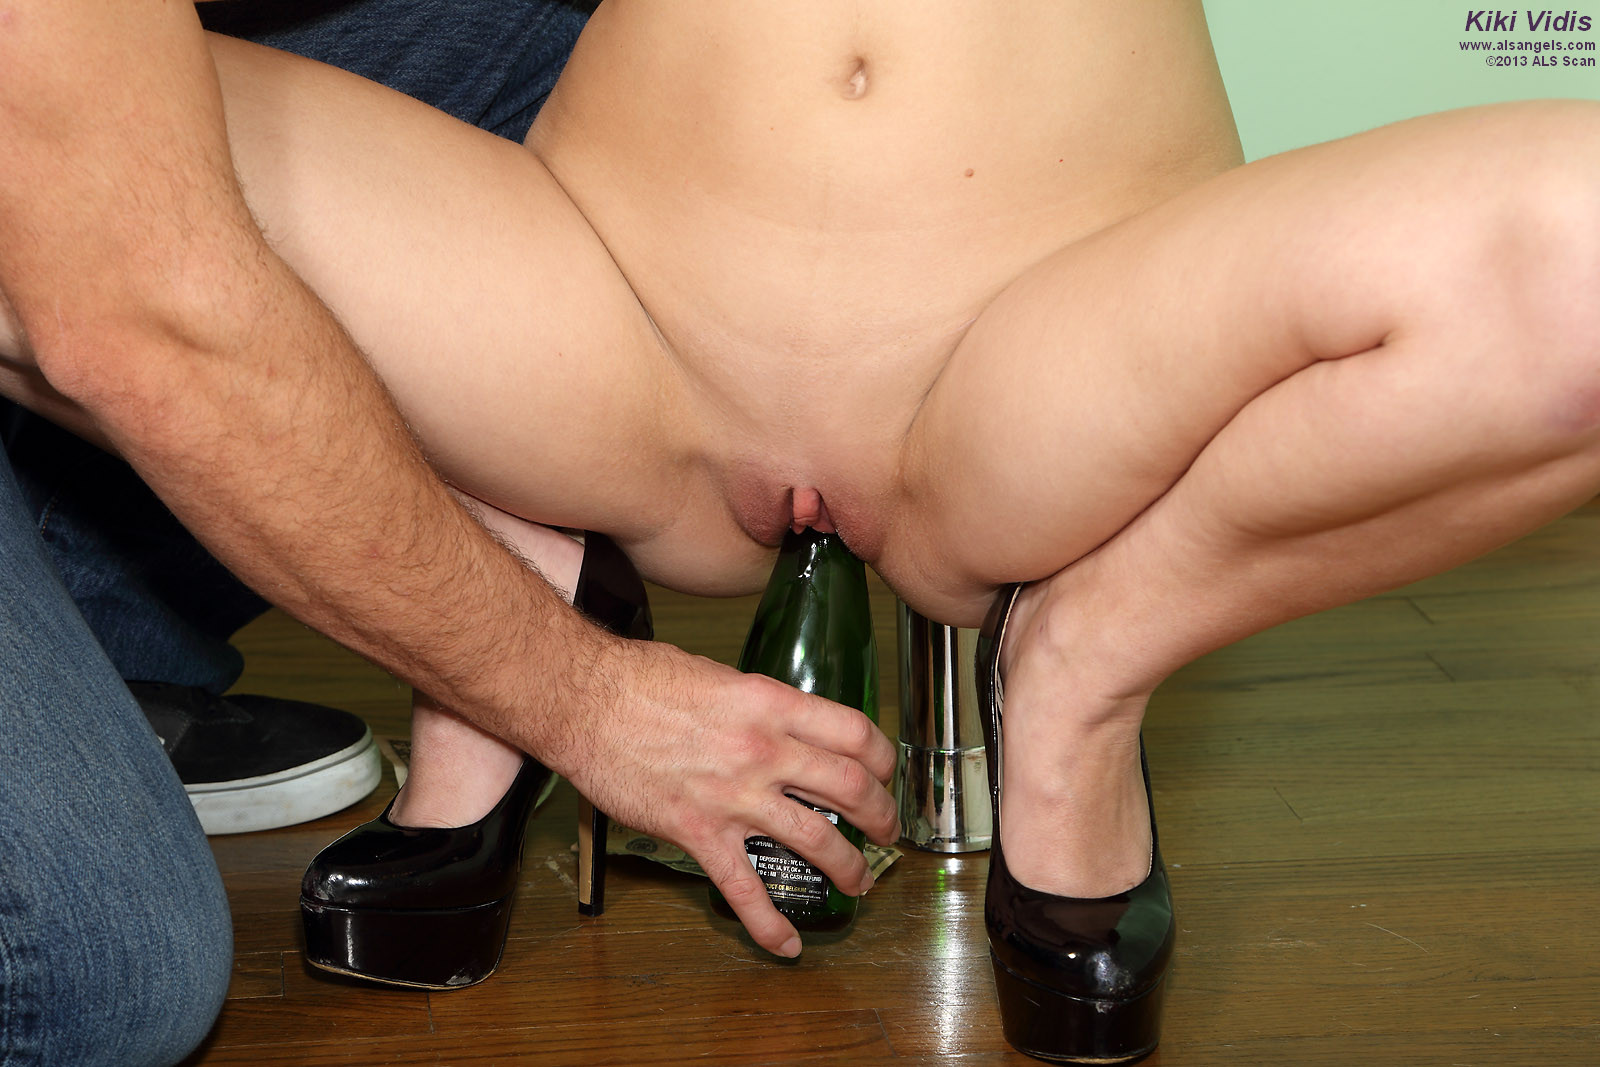 Трахнул толстуху бутылкой, Бутылка Толстушки - Bub Porn -порно видео 11 фотография